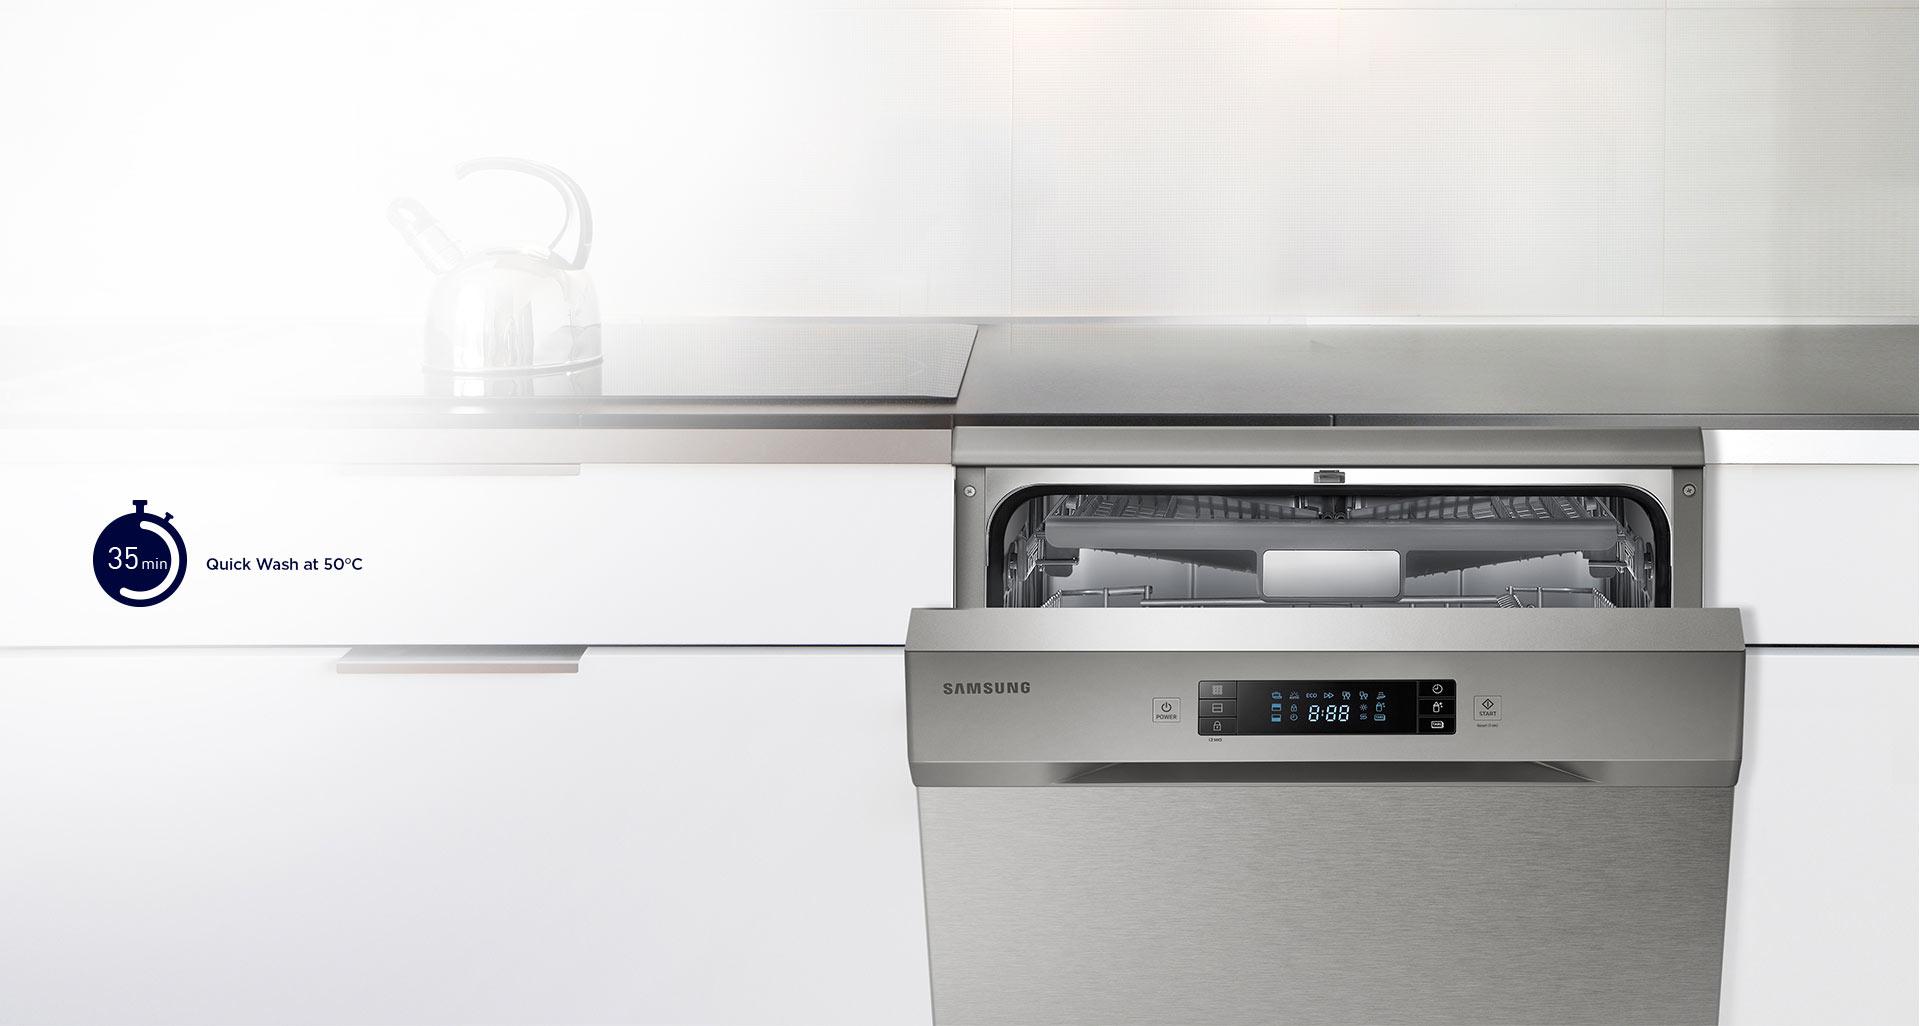 ماشین ظرفشویی سامسونگ DW60M5060BB (2)-min